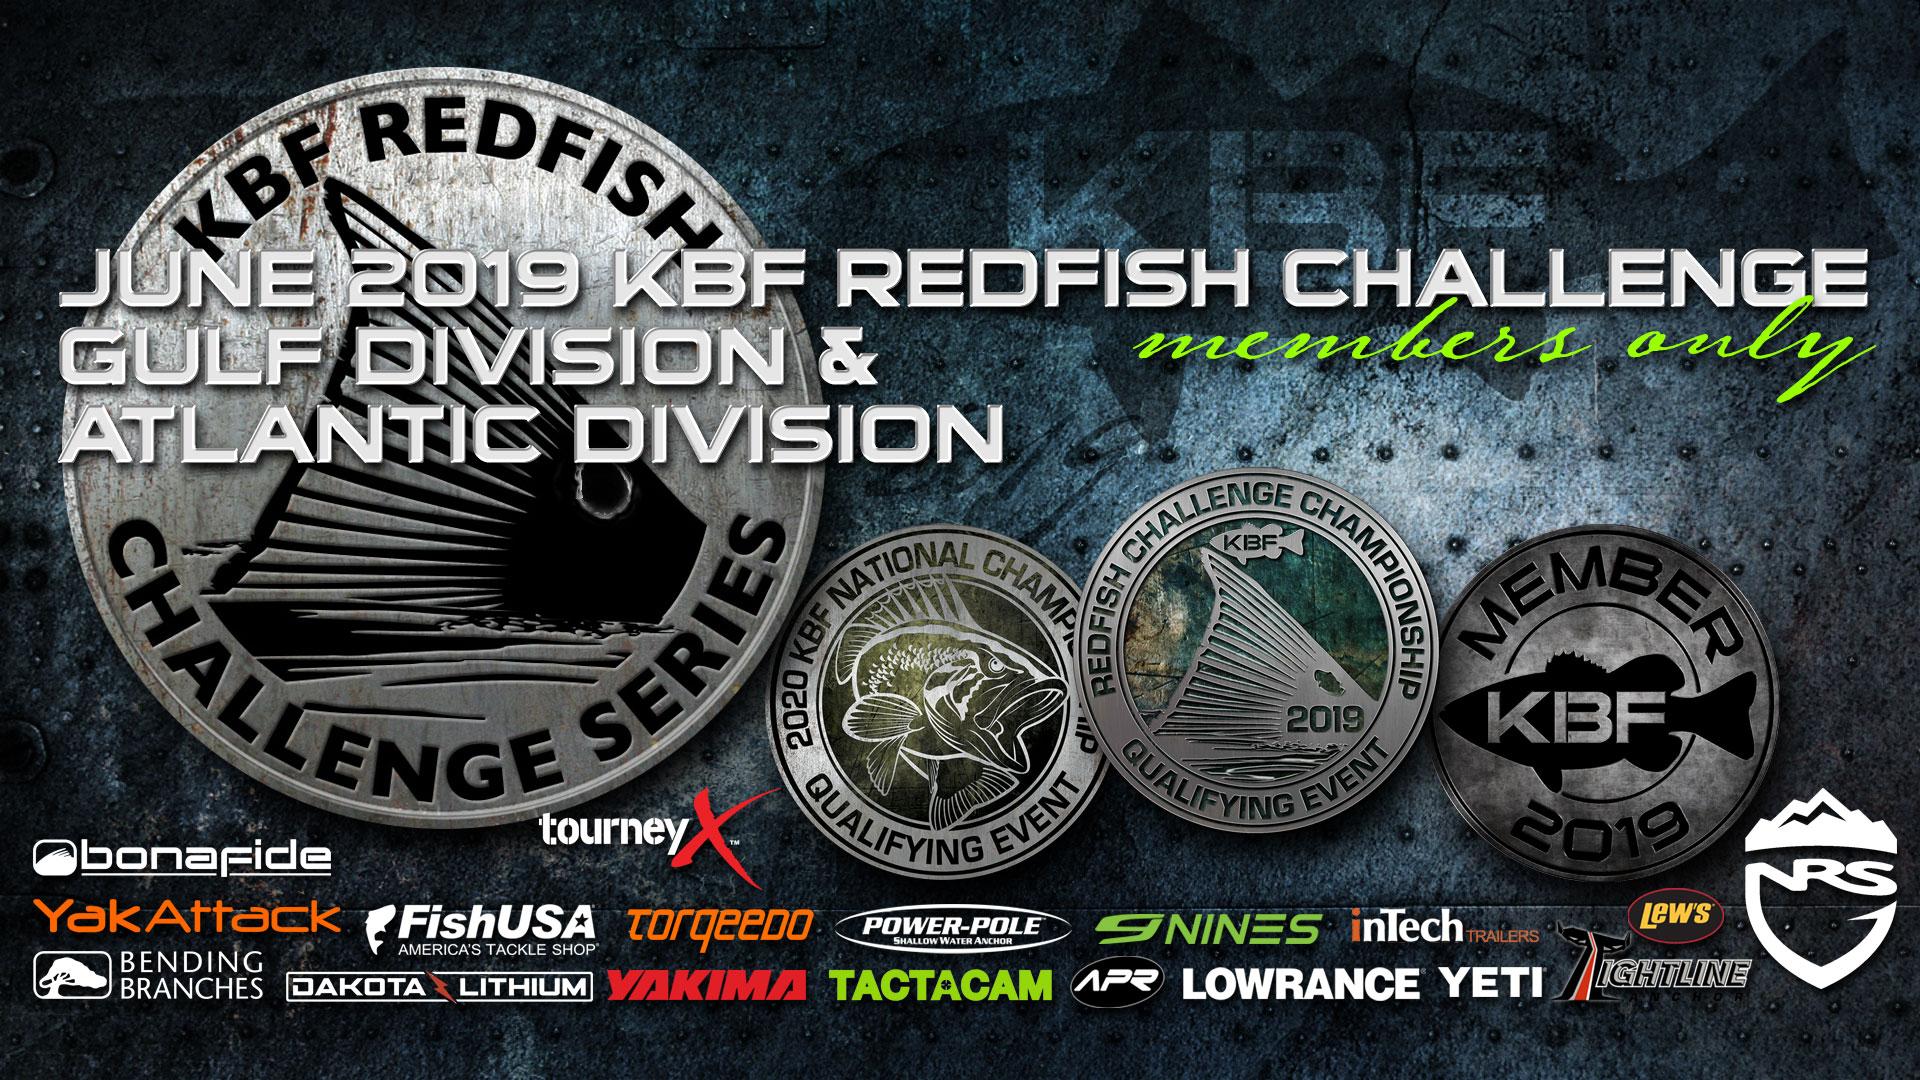 June 2019 KBF Redfish Challenge